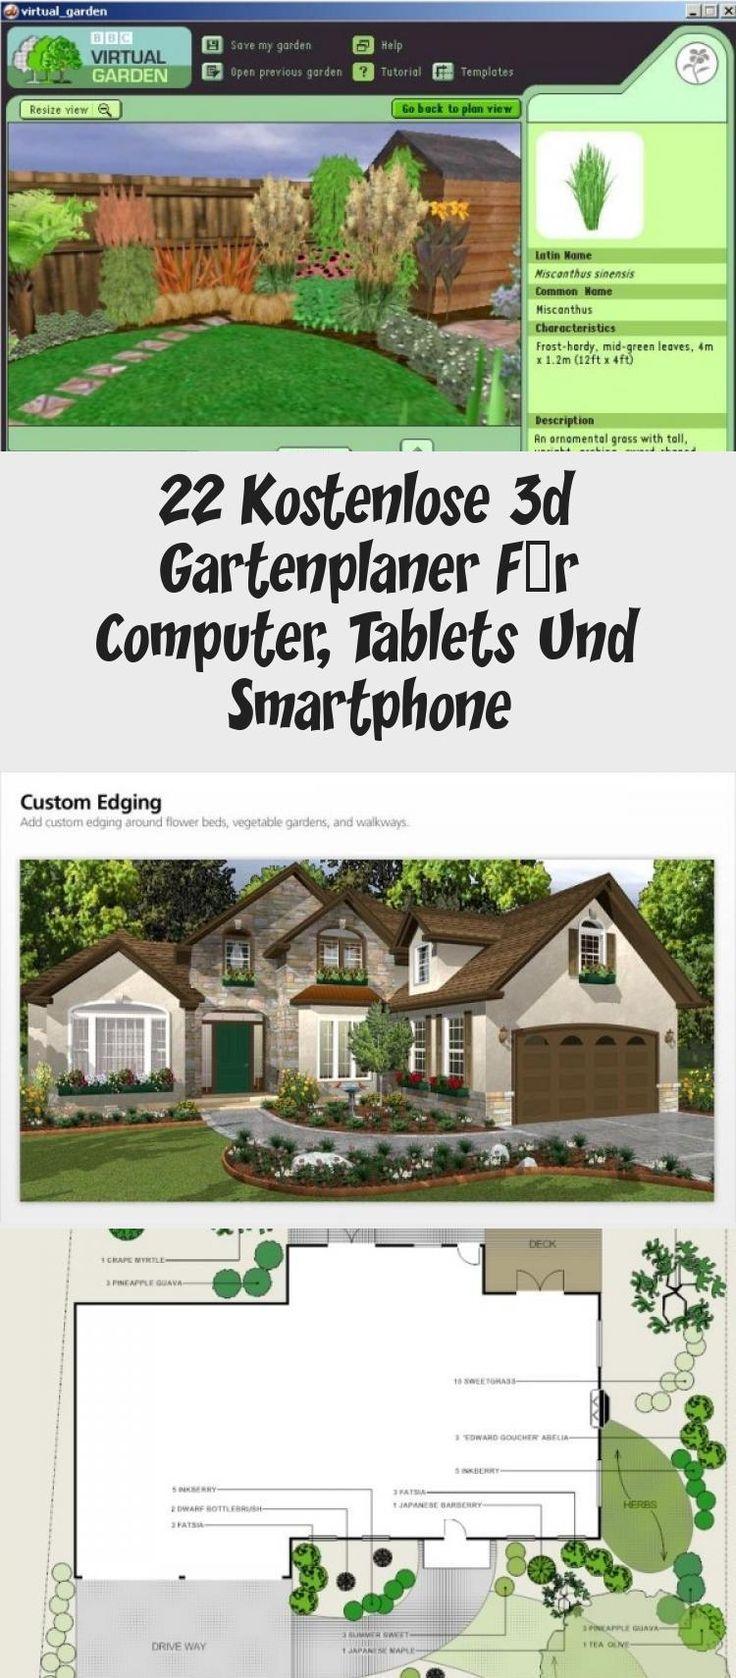 Planer Landschaftsbau Online Software Mein Schoener Garten Planungstool Gartenplanungskizze Gartenplanungideen Gartenpl In 2020 Vegetable Garden House Styles Garden